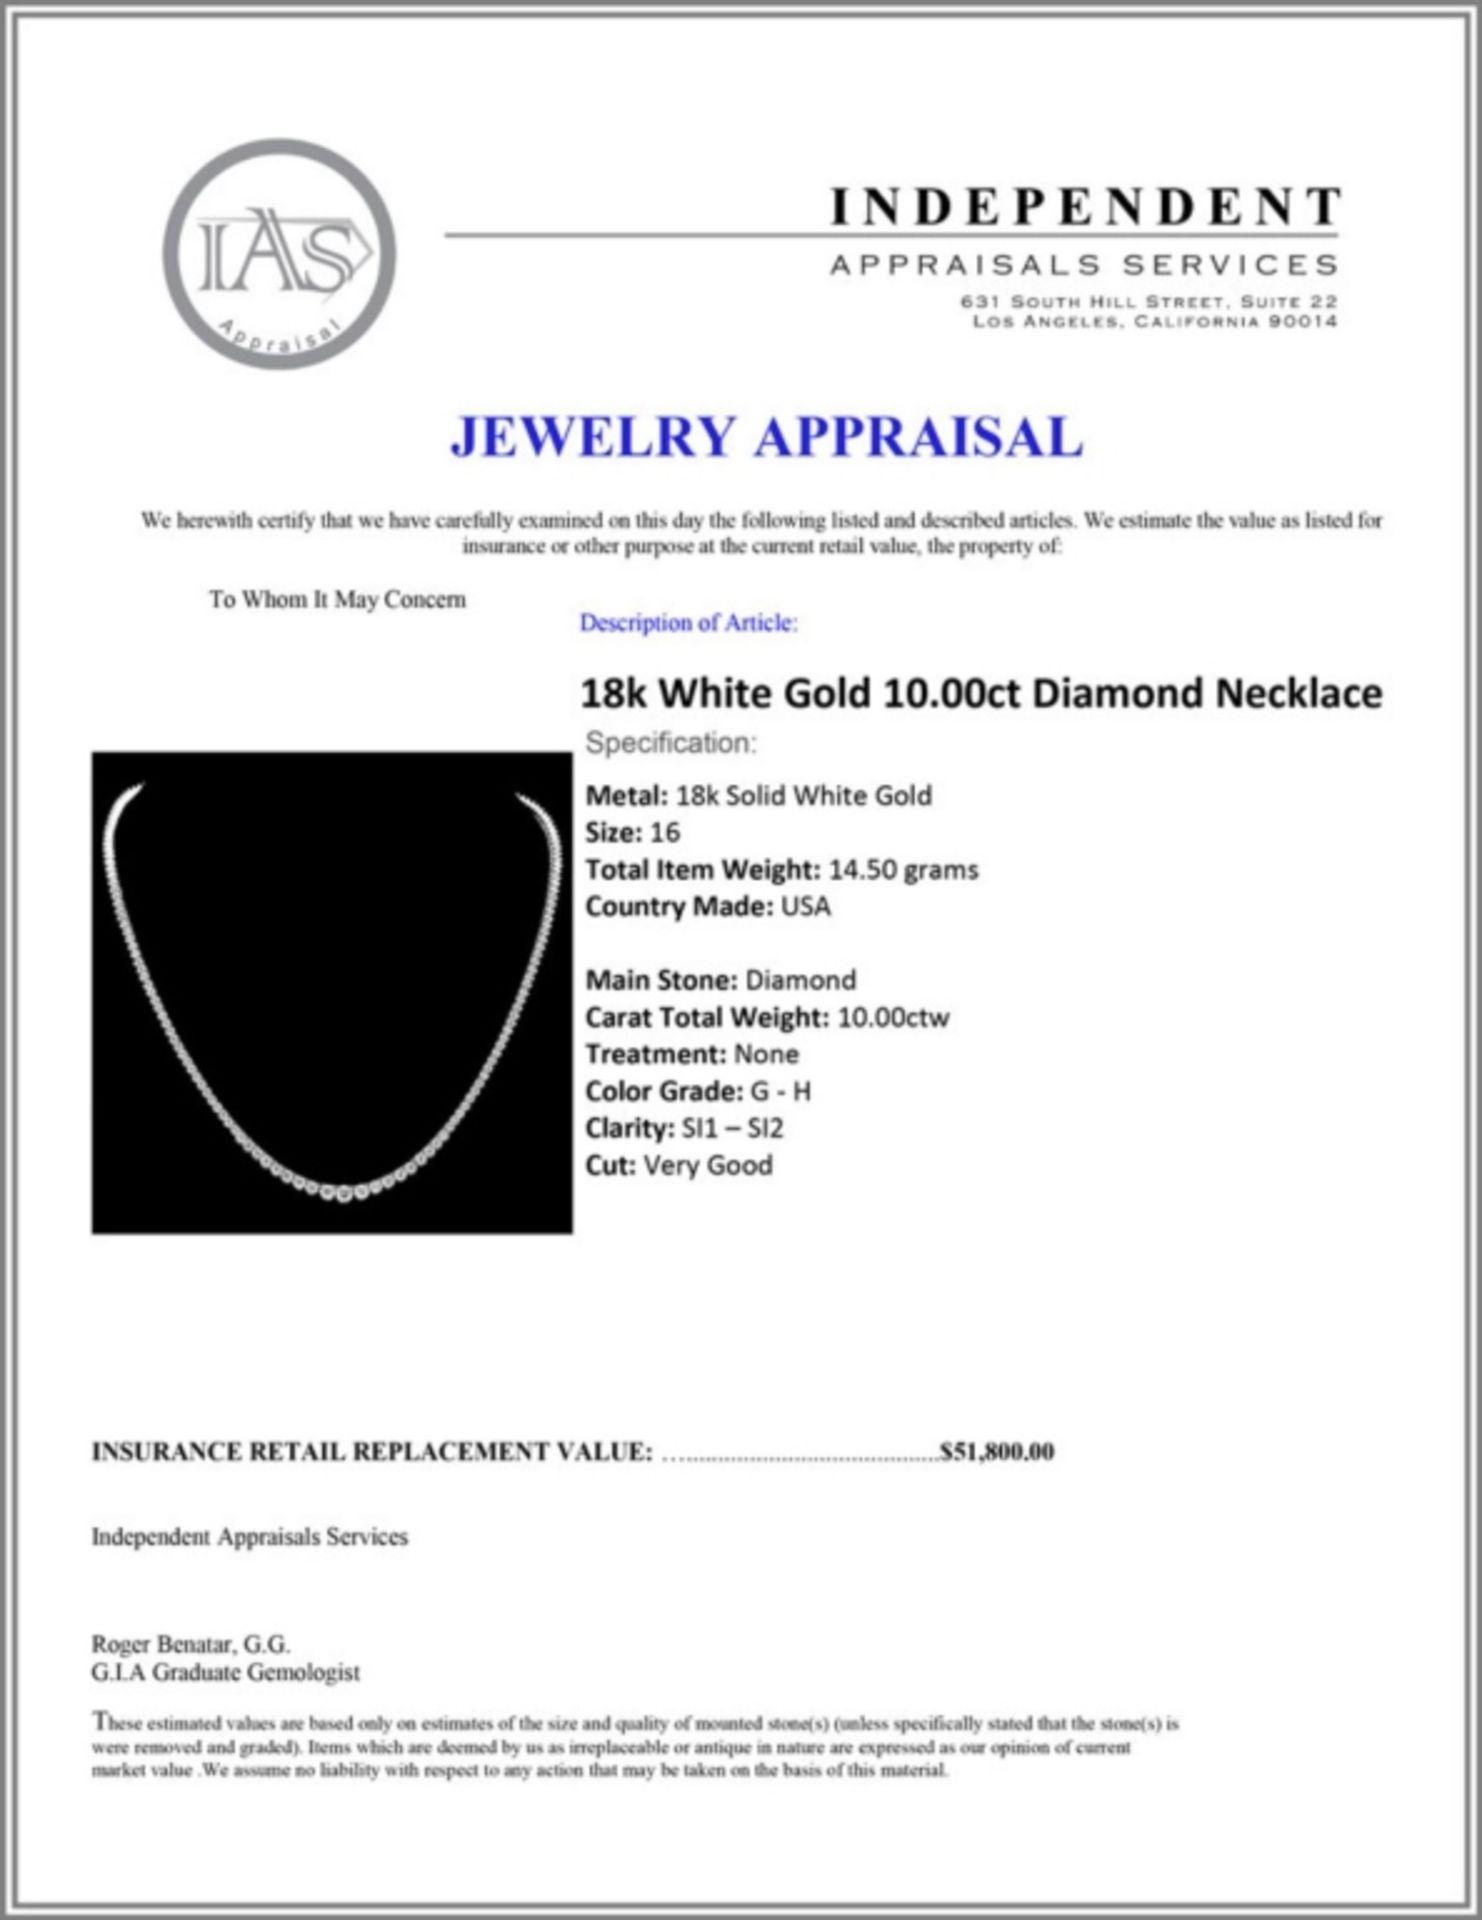 ^18k White Gold 10.00ct Diamond Necklace - Image 5 of 5